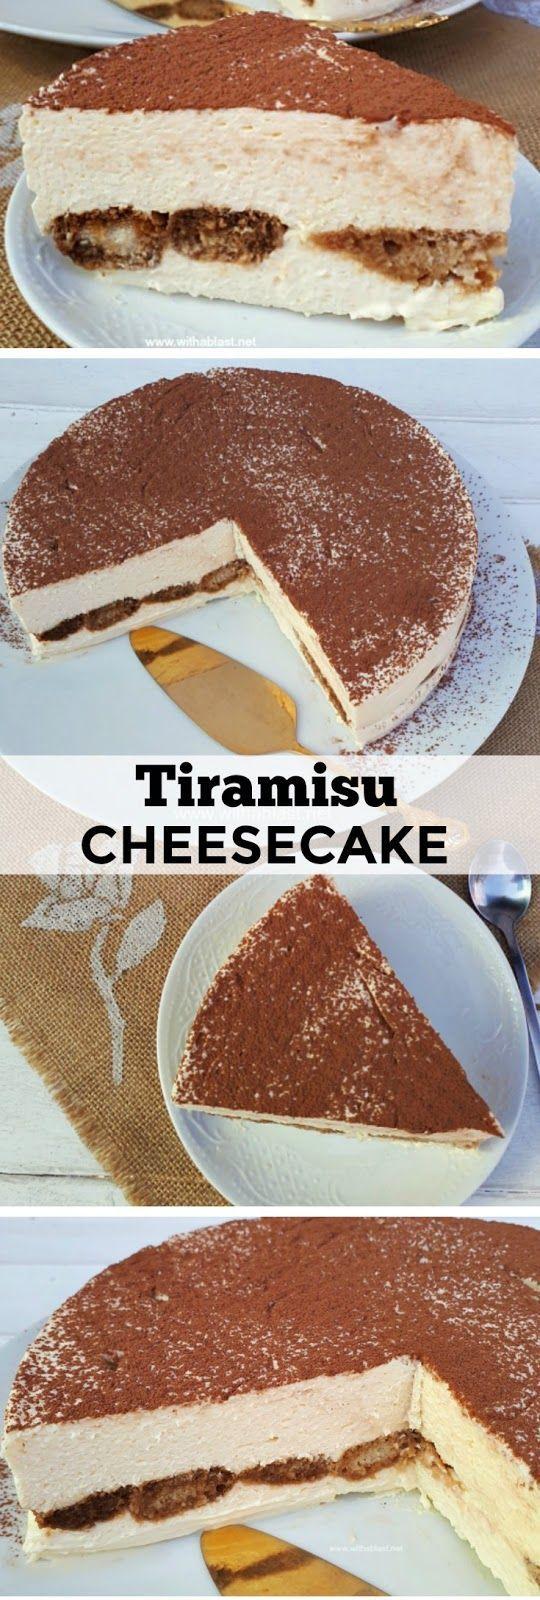 Most decadent ! The creamiest No-Bake Tiramisu Cheesecake ever and requires the minimum prepping ! #Tiramisu #Cheesecake #NoBake #FallDessert #Coffee